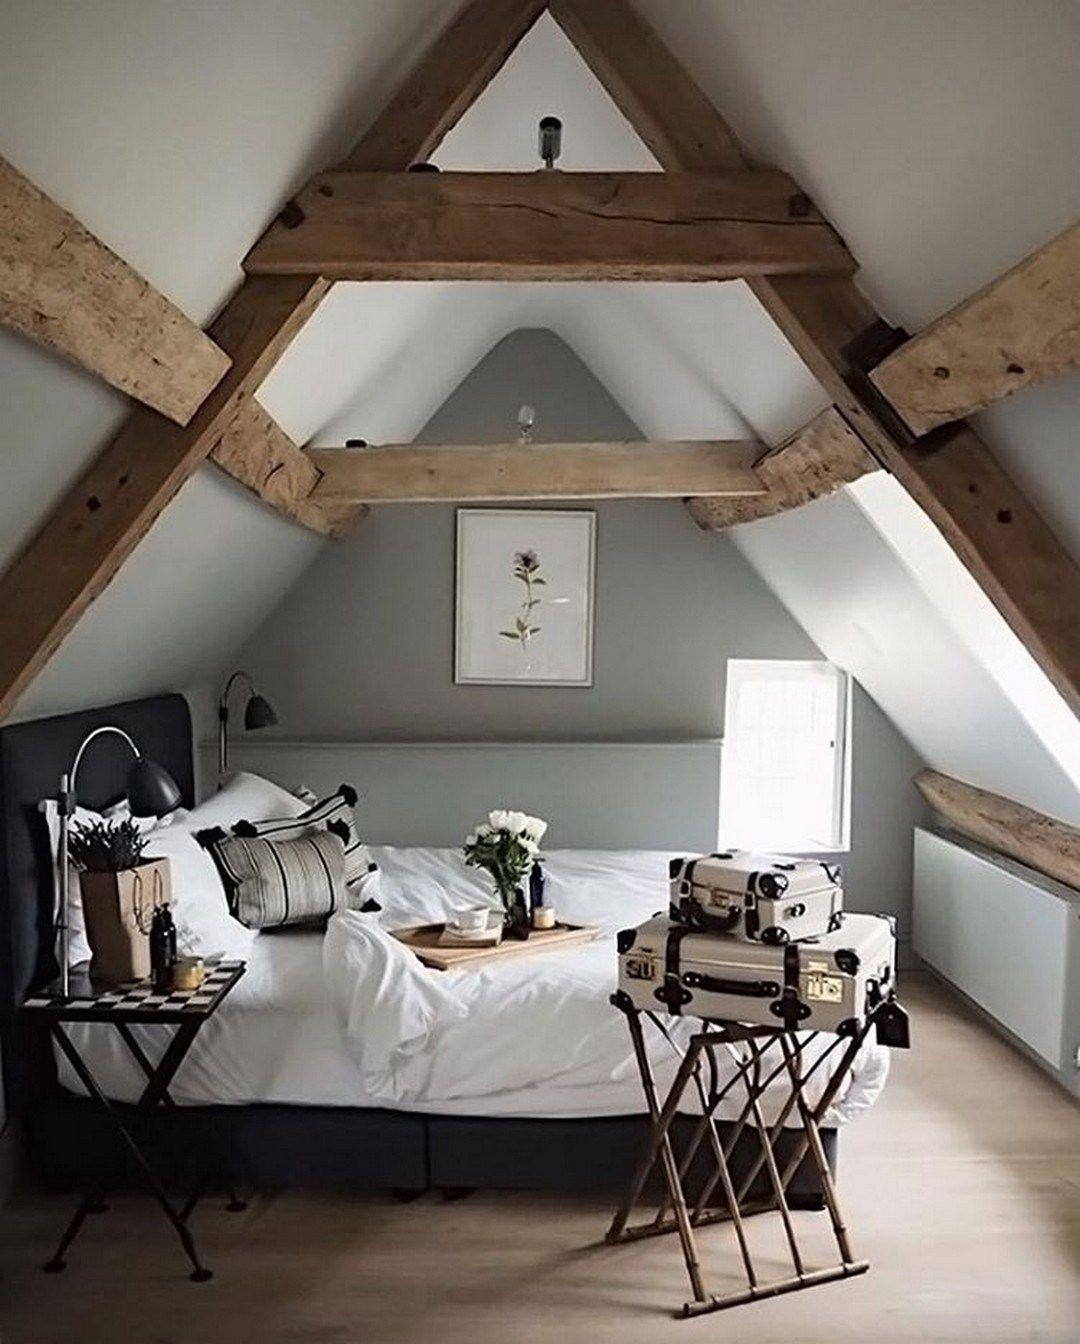 Modern And Stylish Rustic Scandinavian Bedroom Decor Decomagz Attic Bedroom Designs Scandinavian Design Bedroom Bedroom Design